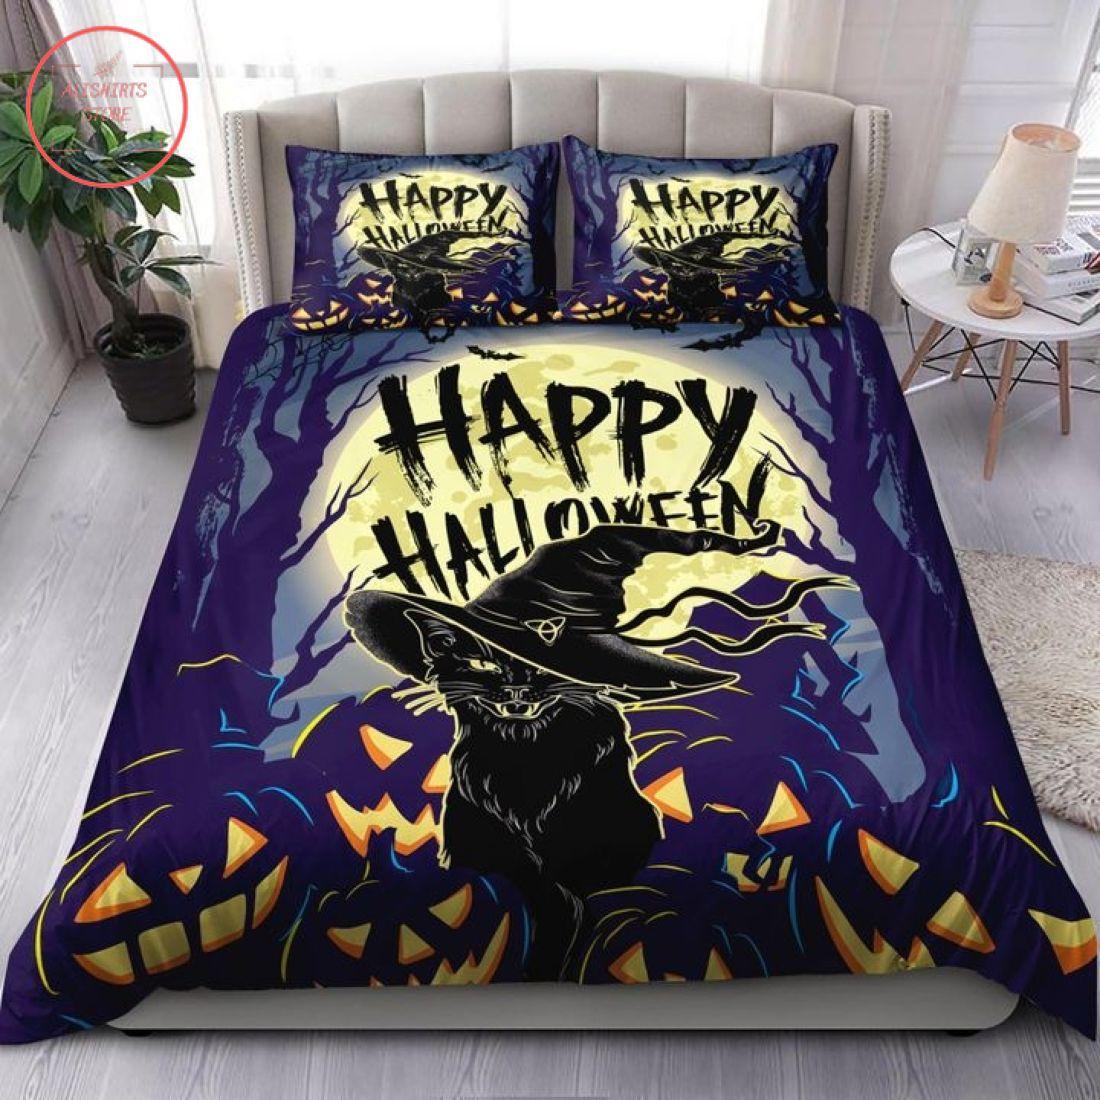 Creepy Black Cat Halloween Blanket